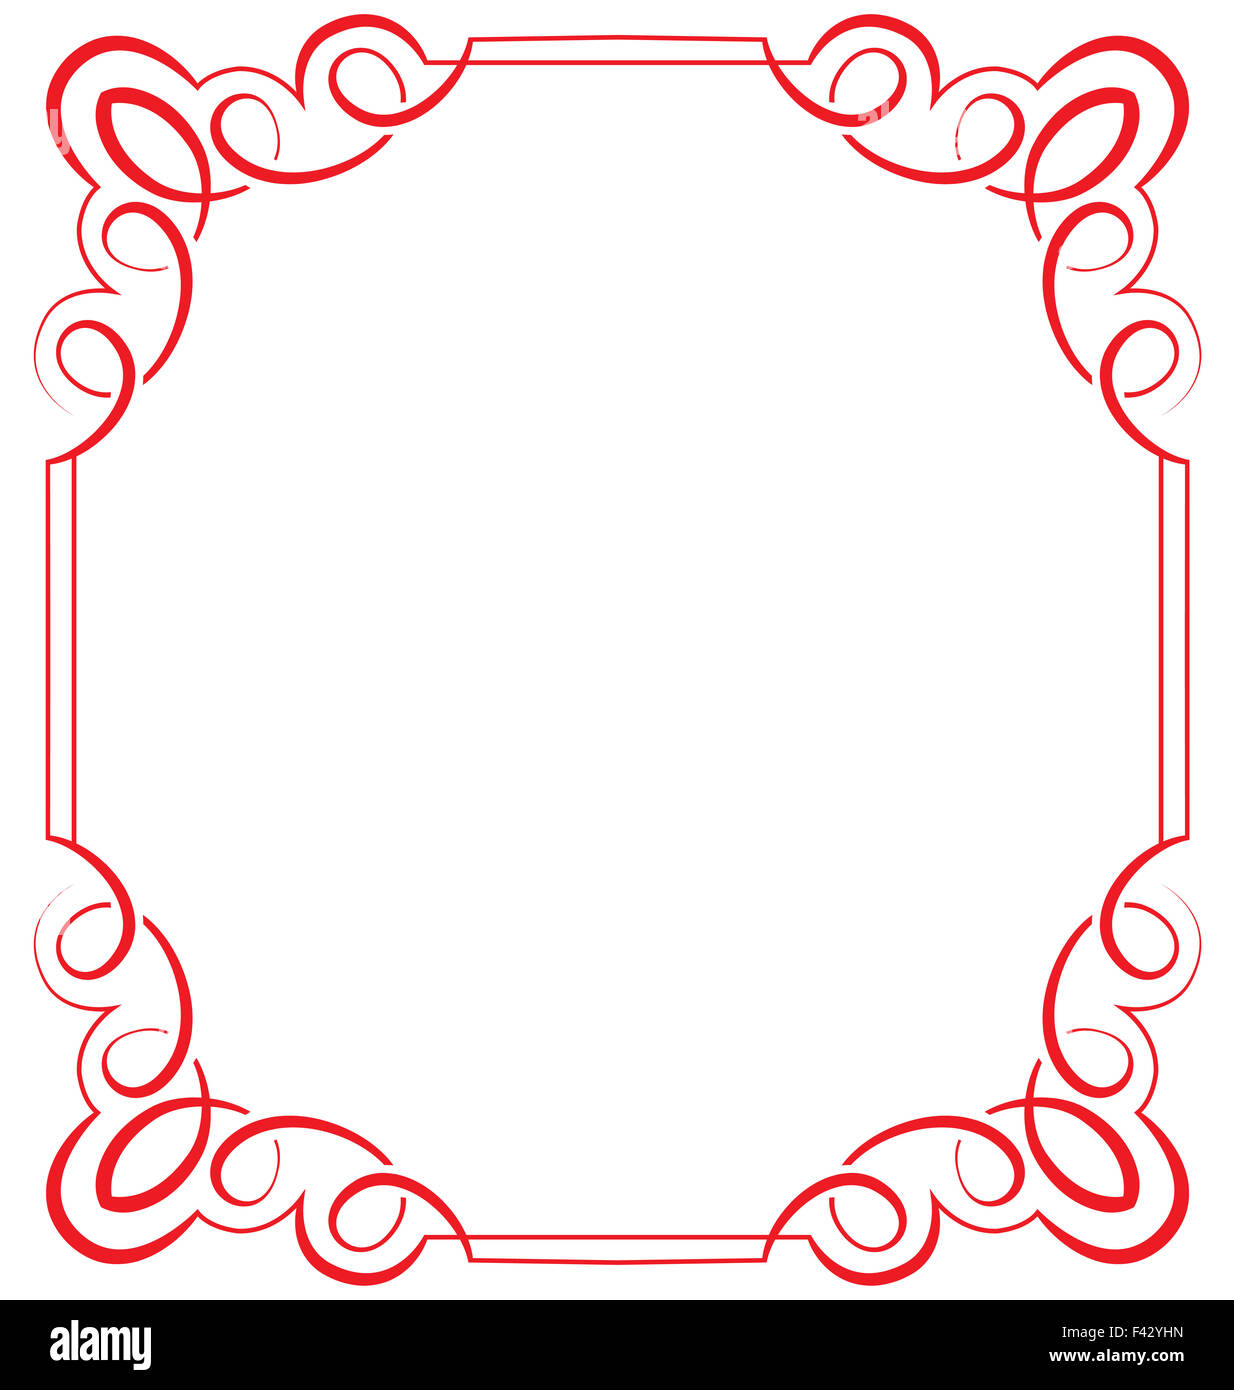 ornate frame vector stock photos ornate frame vector stock images